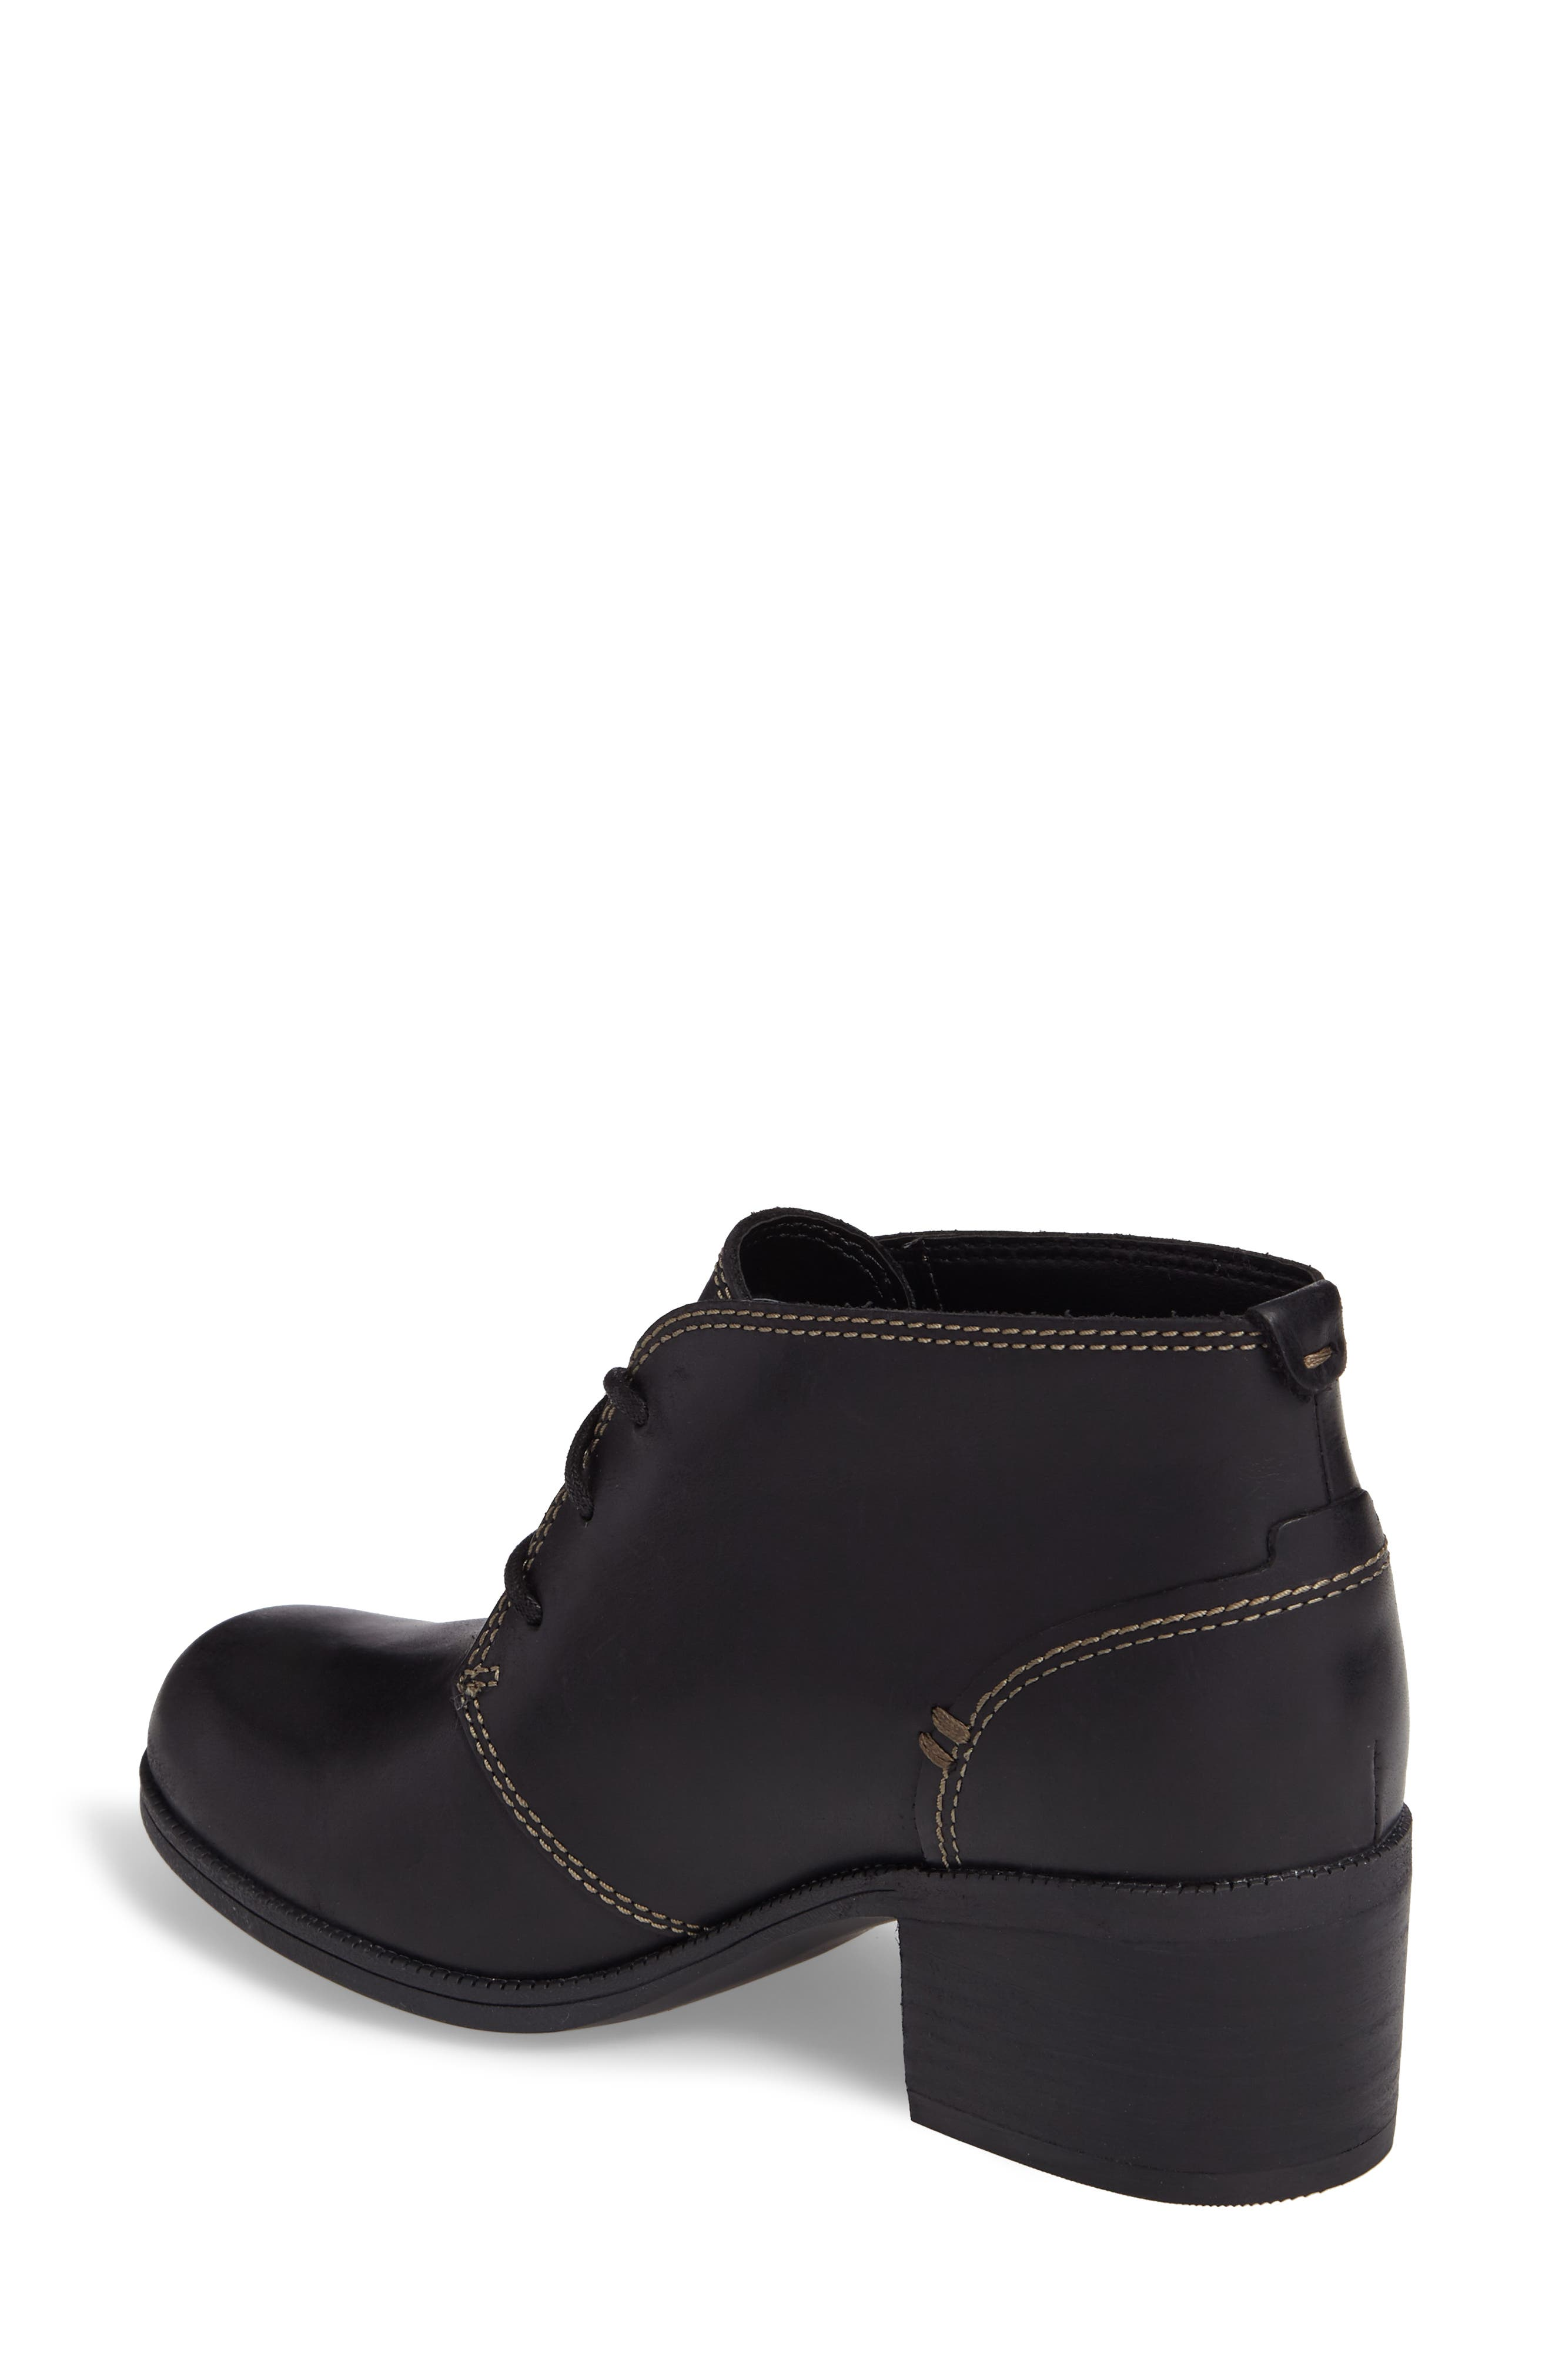 Alternate Image 2  - Clarks® Maypearl Floral Boot (Women)